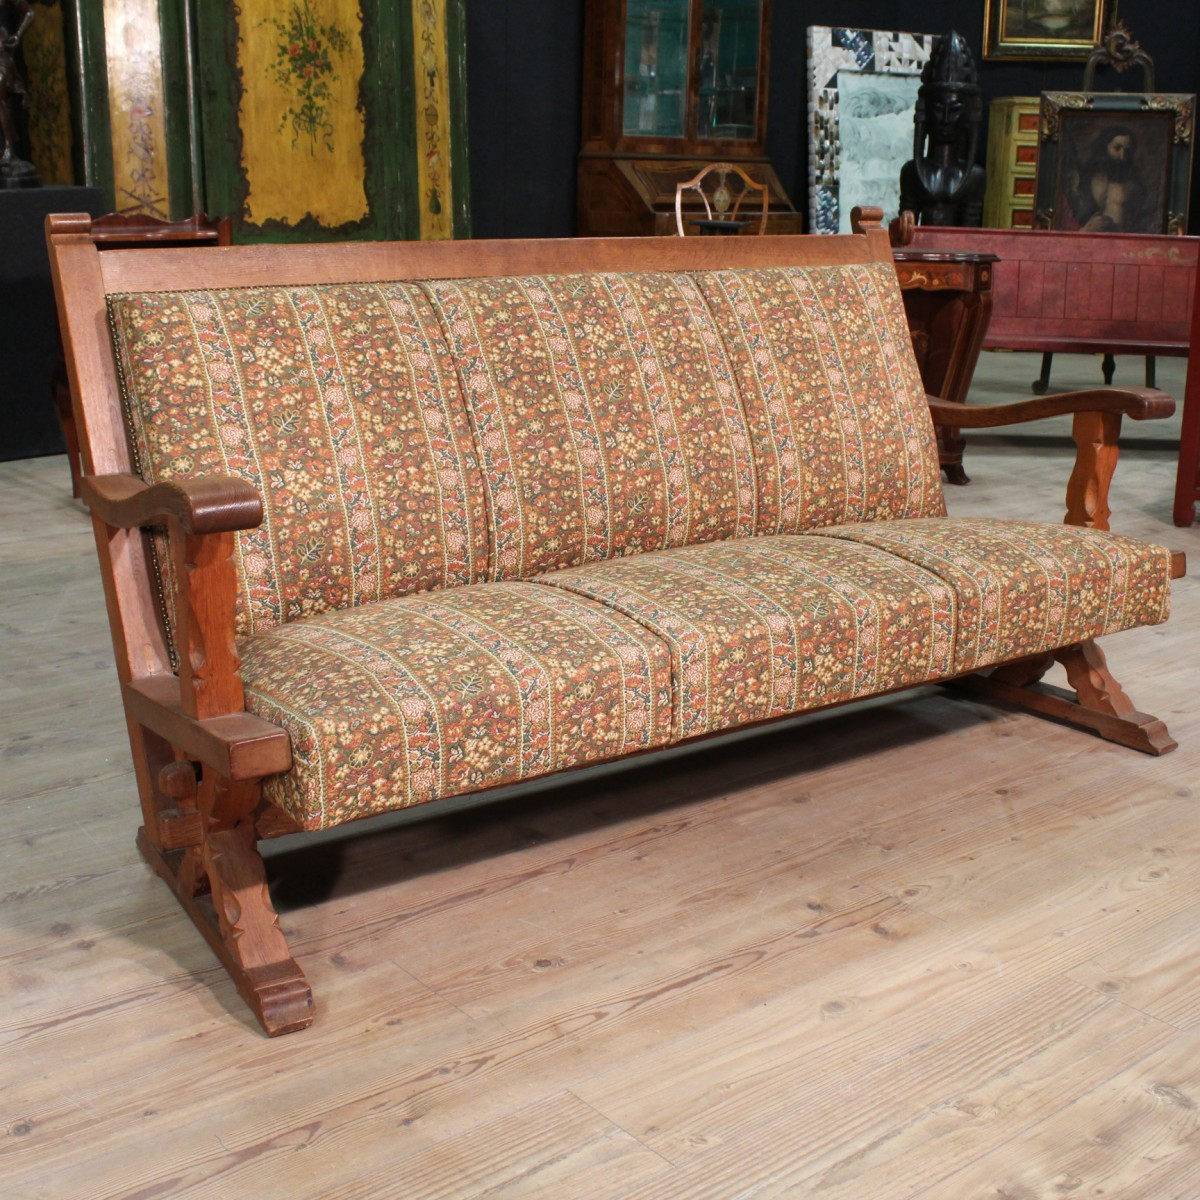 sofa rustic armchair furniture wood painted oak floral. Black Bedroom Furniture Sets. Home Design Ideas